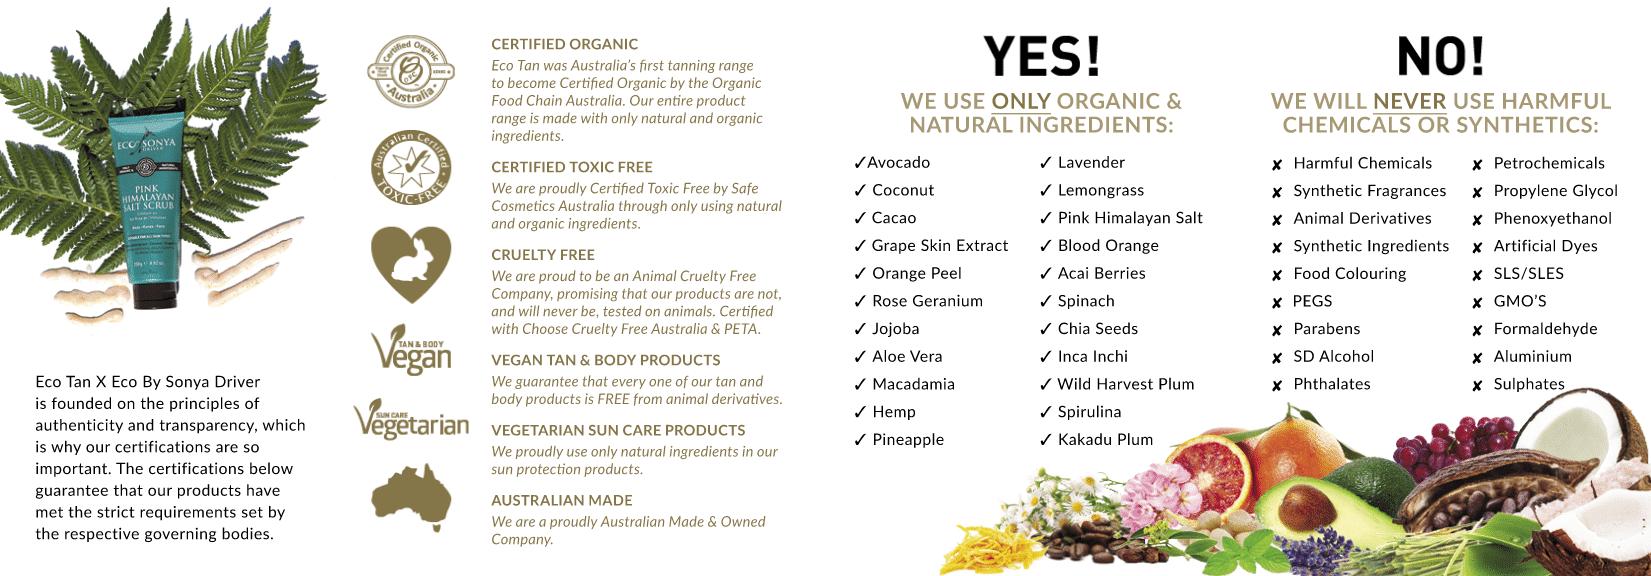 Eco Tan Information